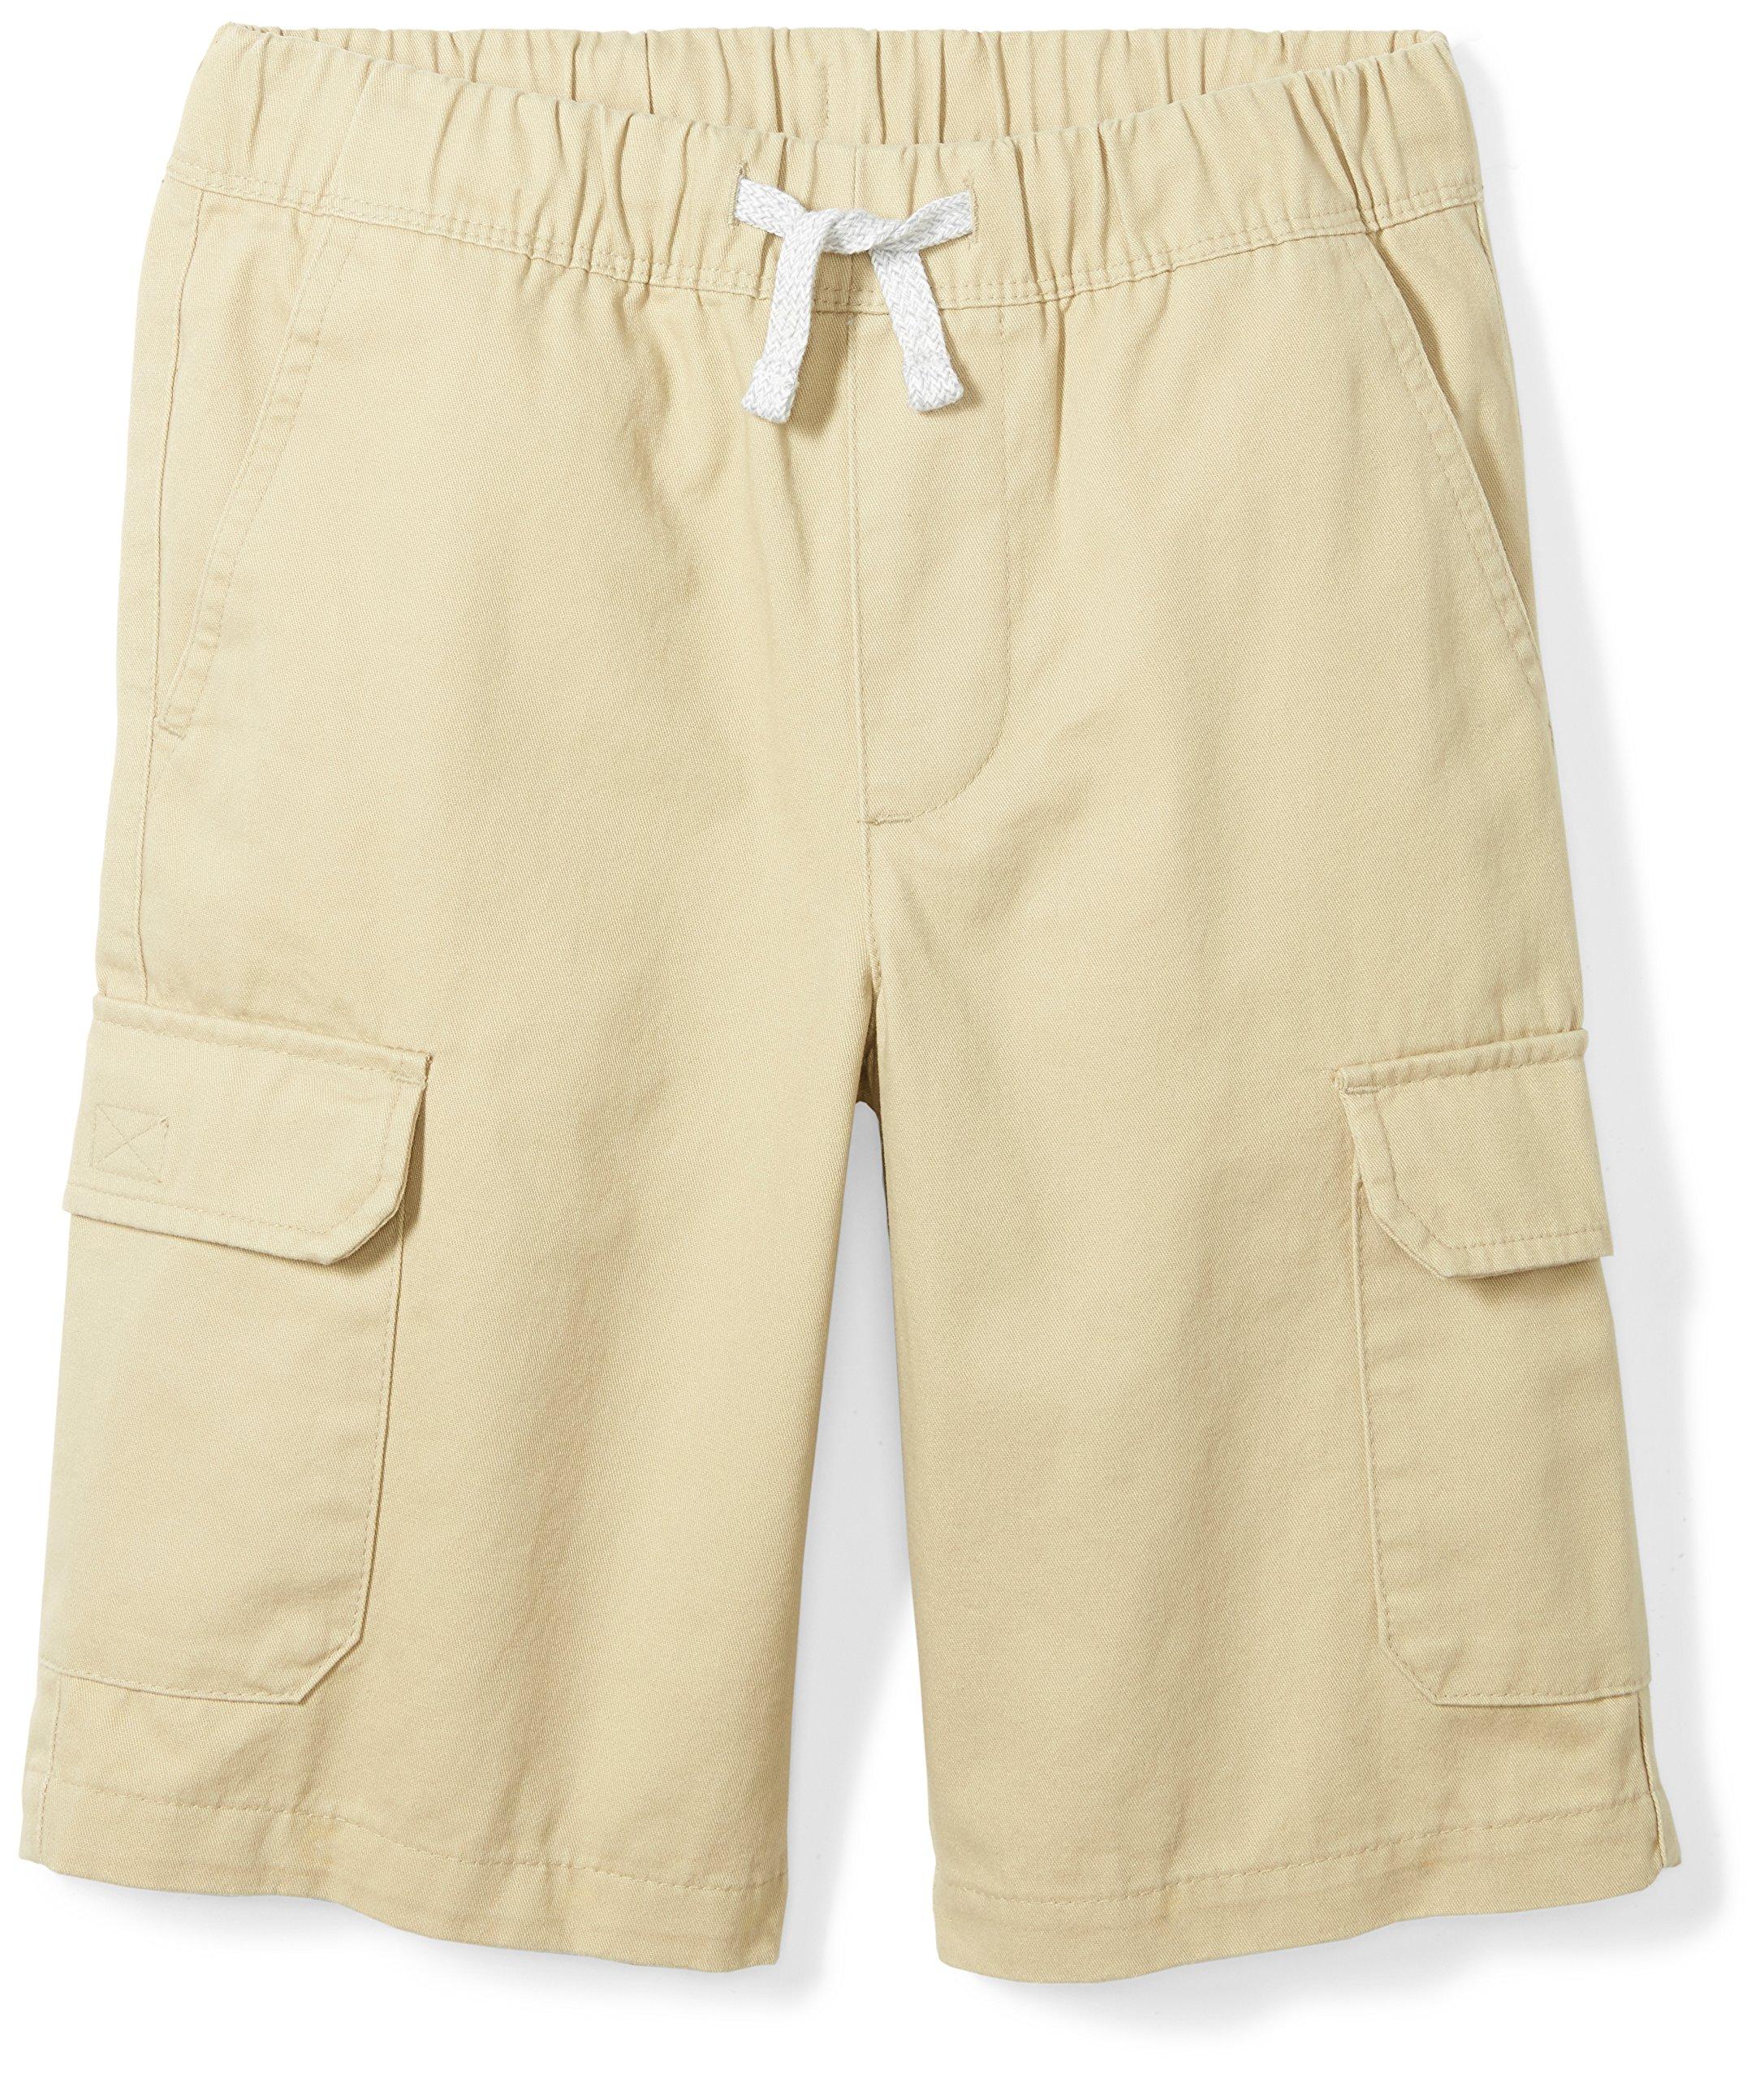 cf9d54e6d6 Amazon Brand - Spotted Zebra Boys' Toddler Cargo Shorts, Light Khaki, 4T